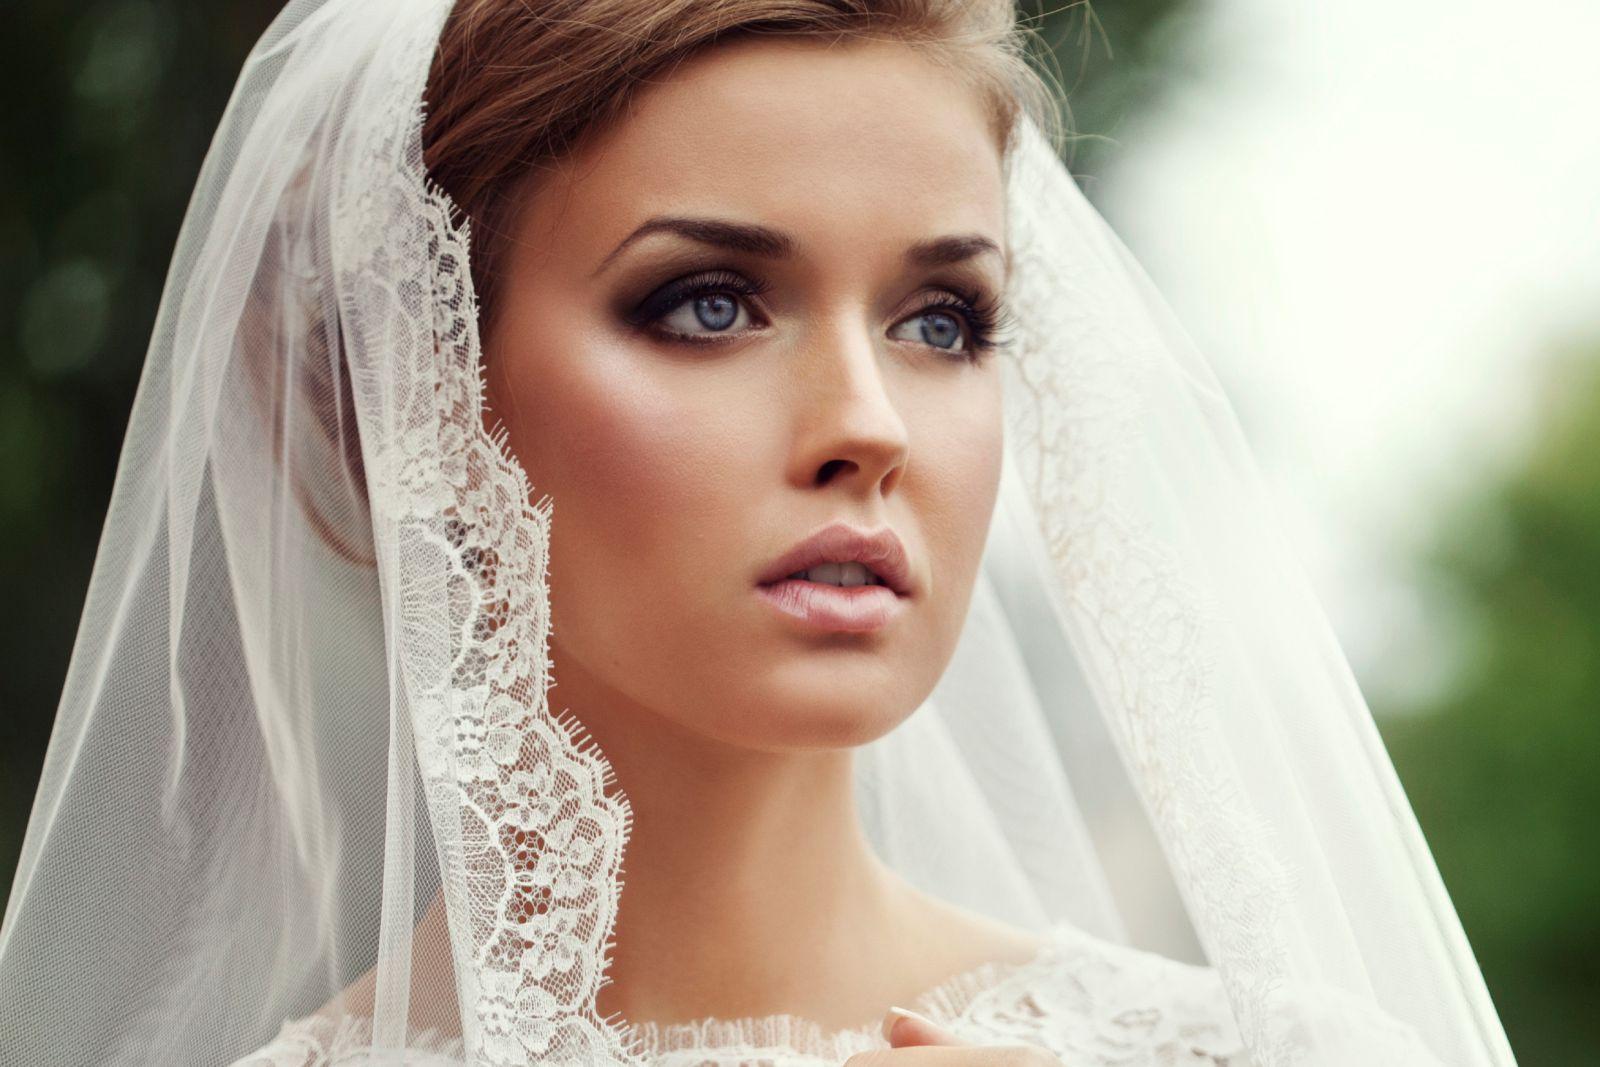 Makeup Bride 2014 ���� 2014 bridal-beauty-inspiration-dramatic-eyes-for-the-wedding-6.original.jpg?1357336714